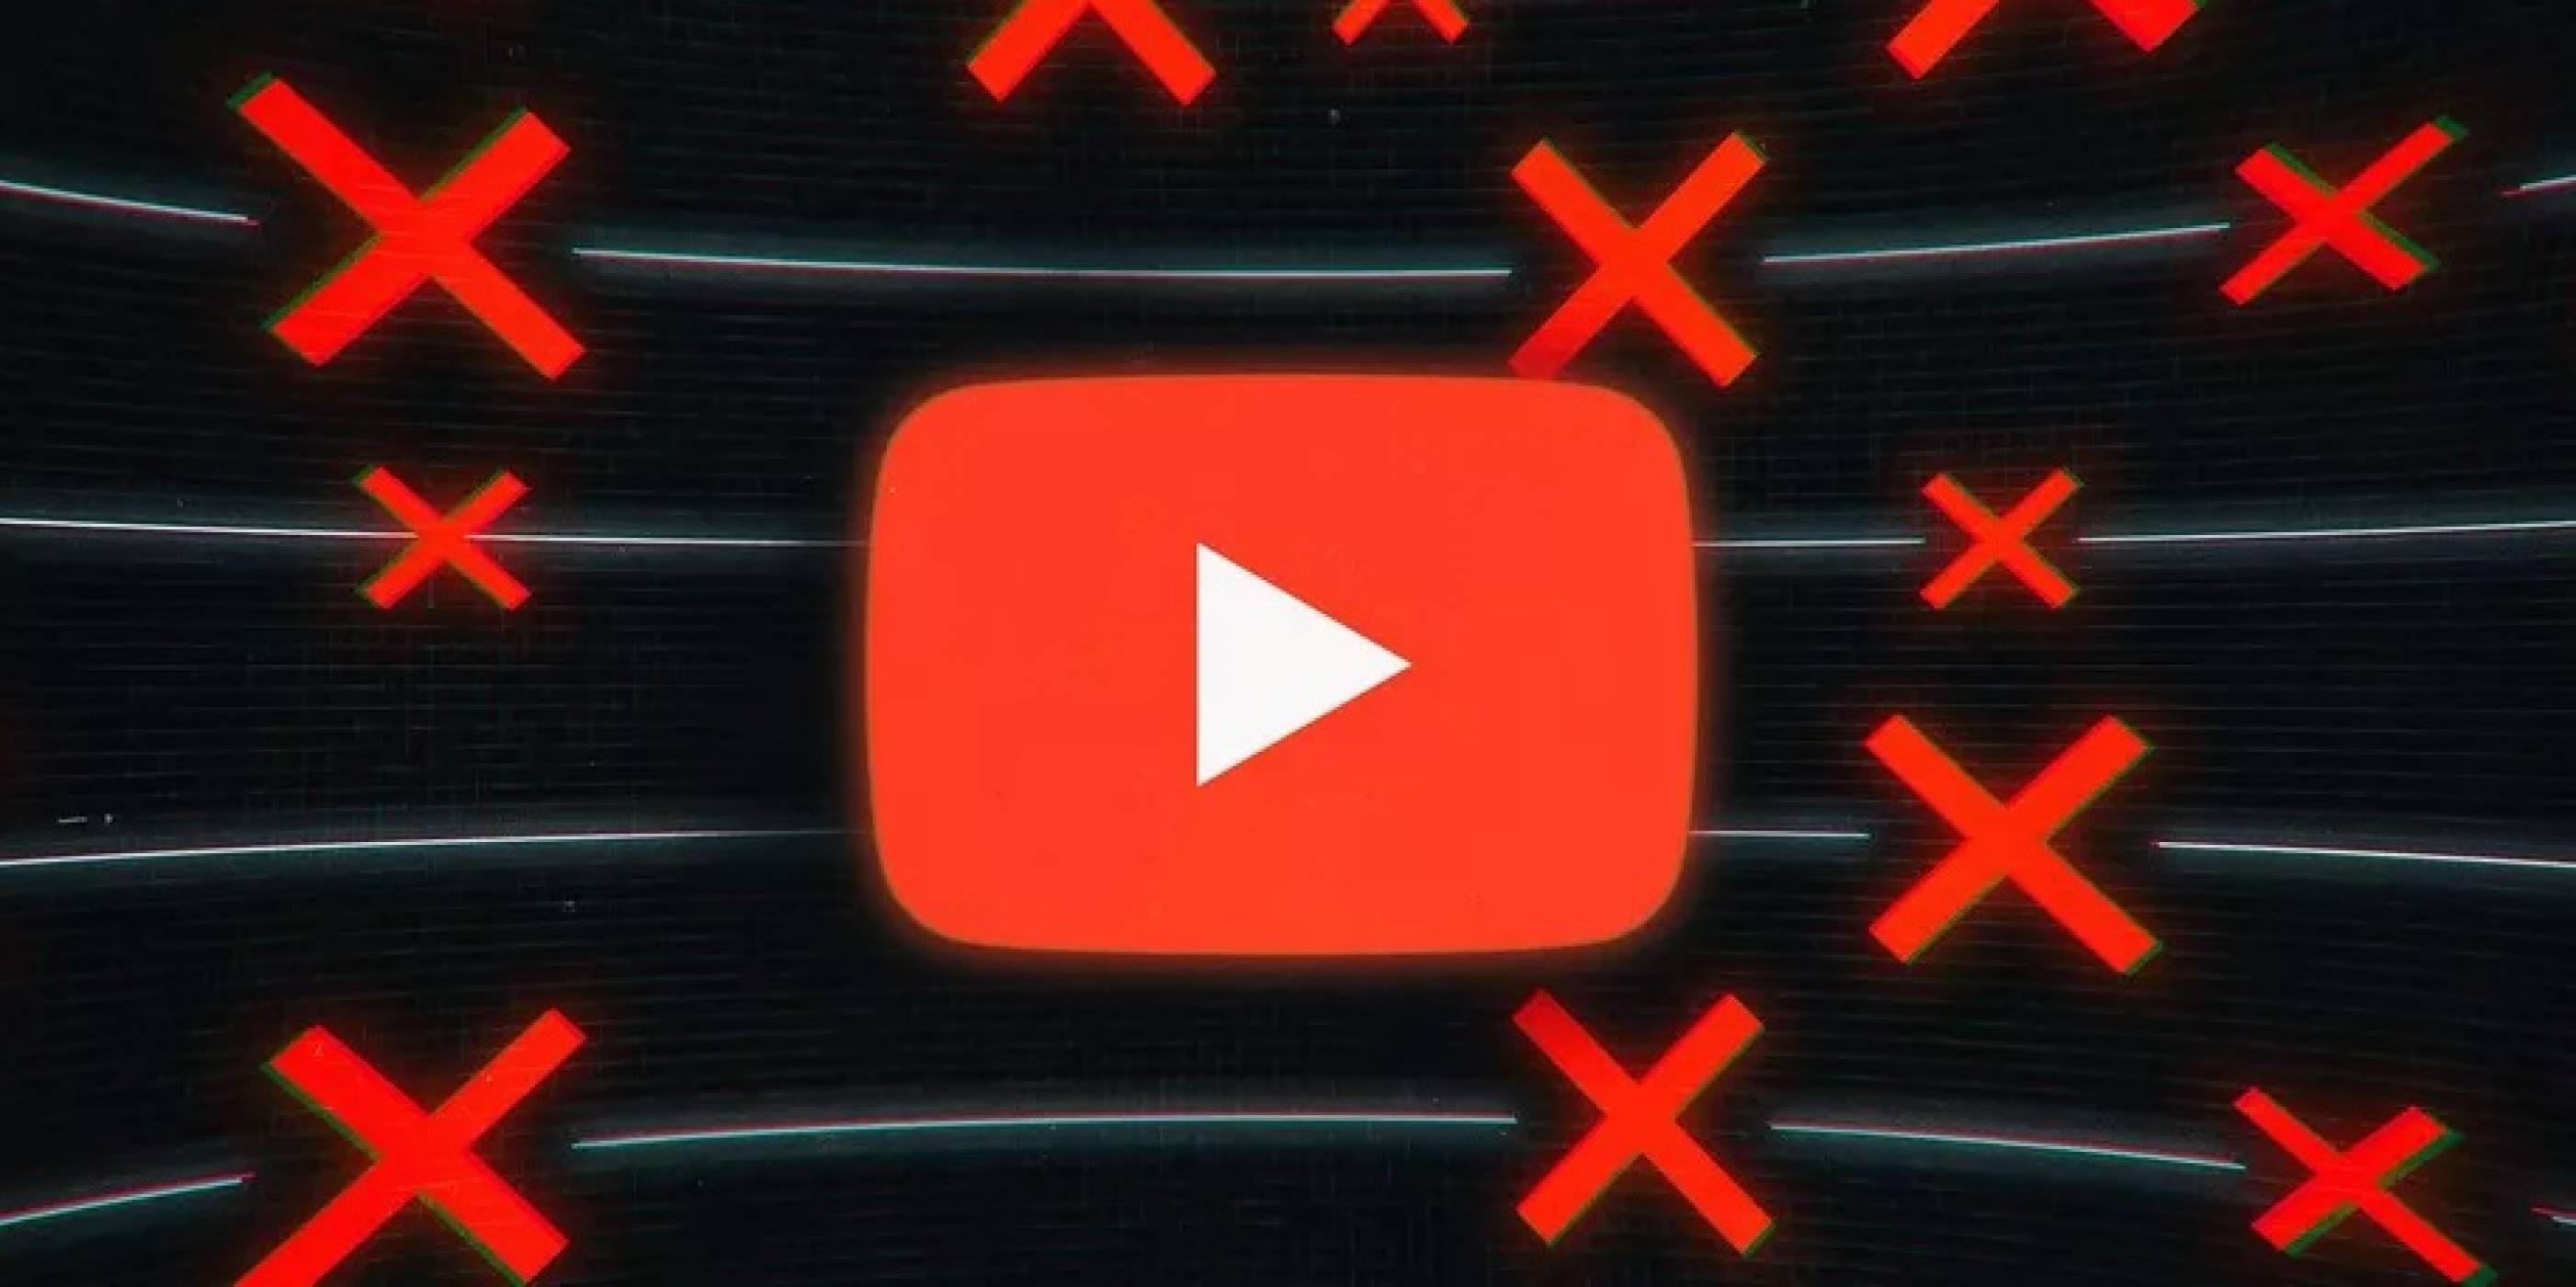 Новите правила на YouTube не се харесаха на мнозина